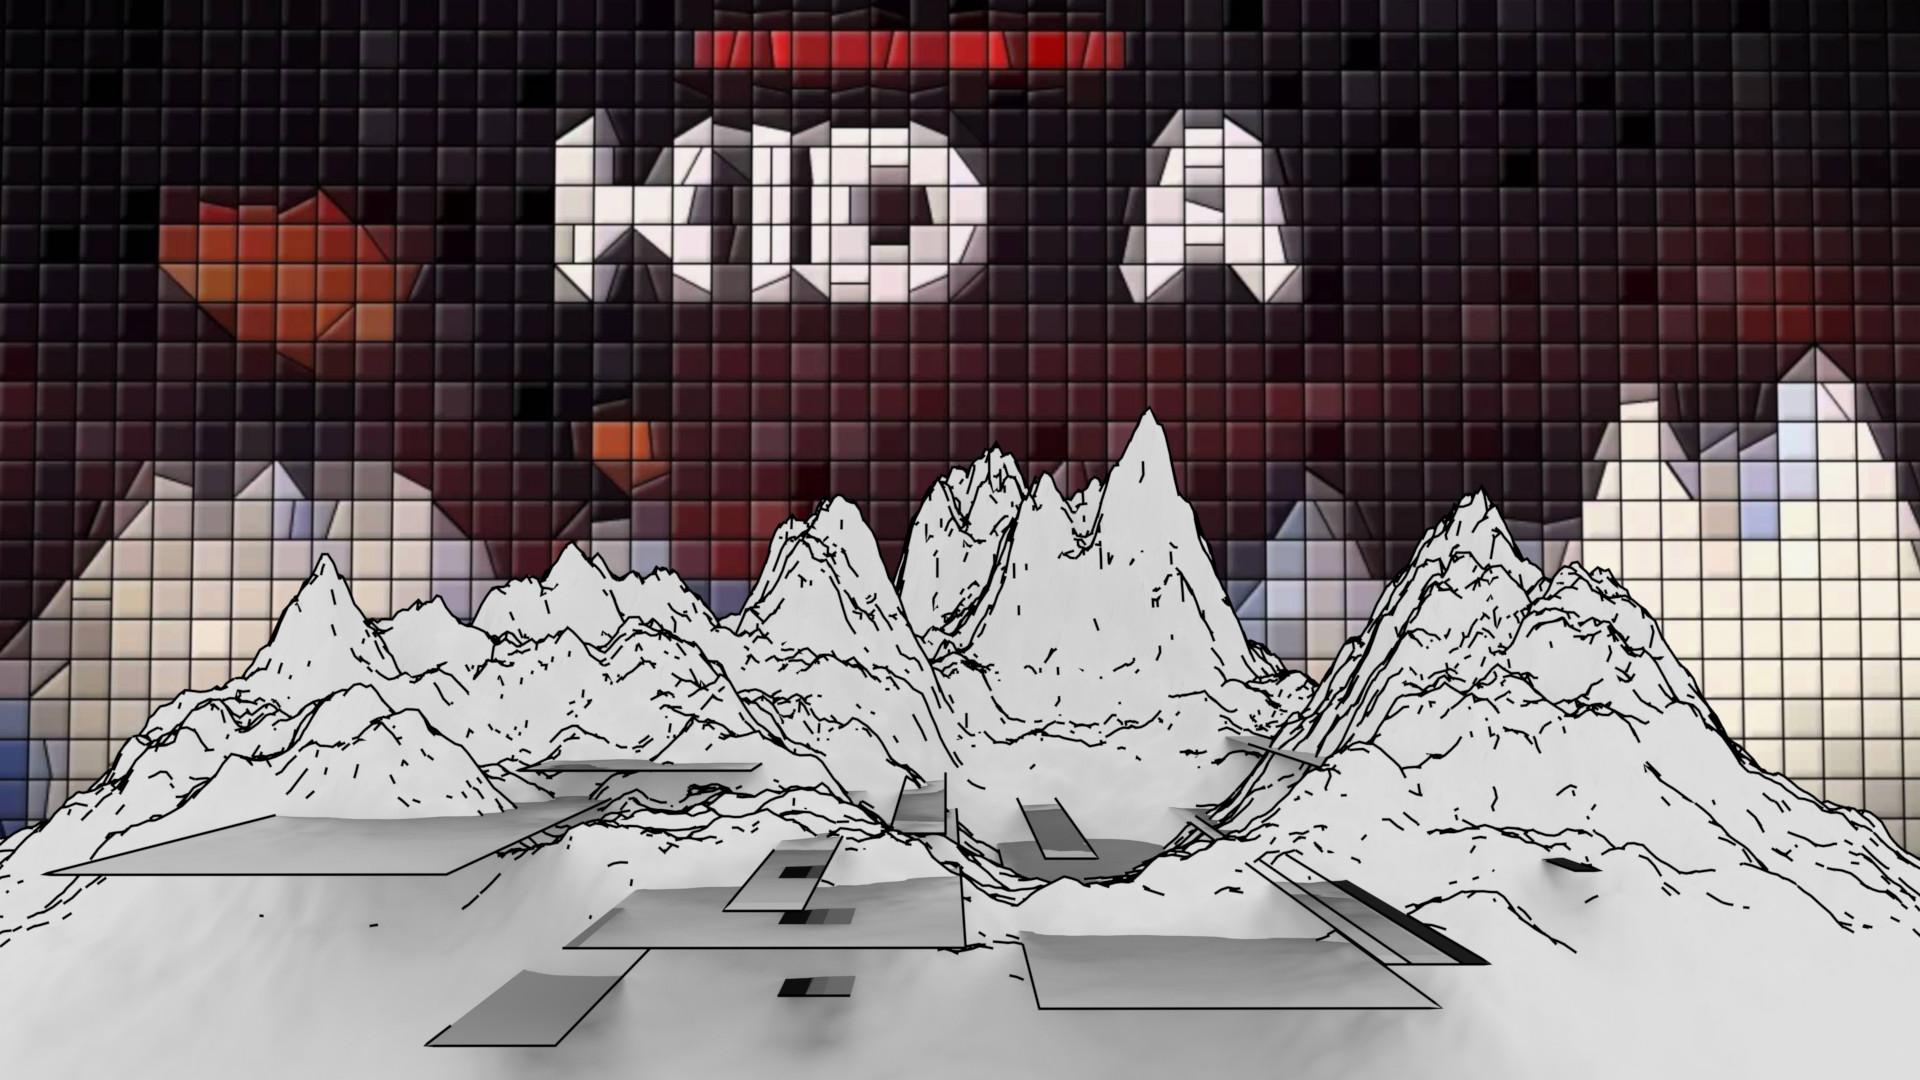 Artstation radiohead kid a 3d art wallpaper full hd radiohead kid a 3d art wallpaper full hd 1920x1080 voltagebd Choice Image